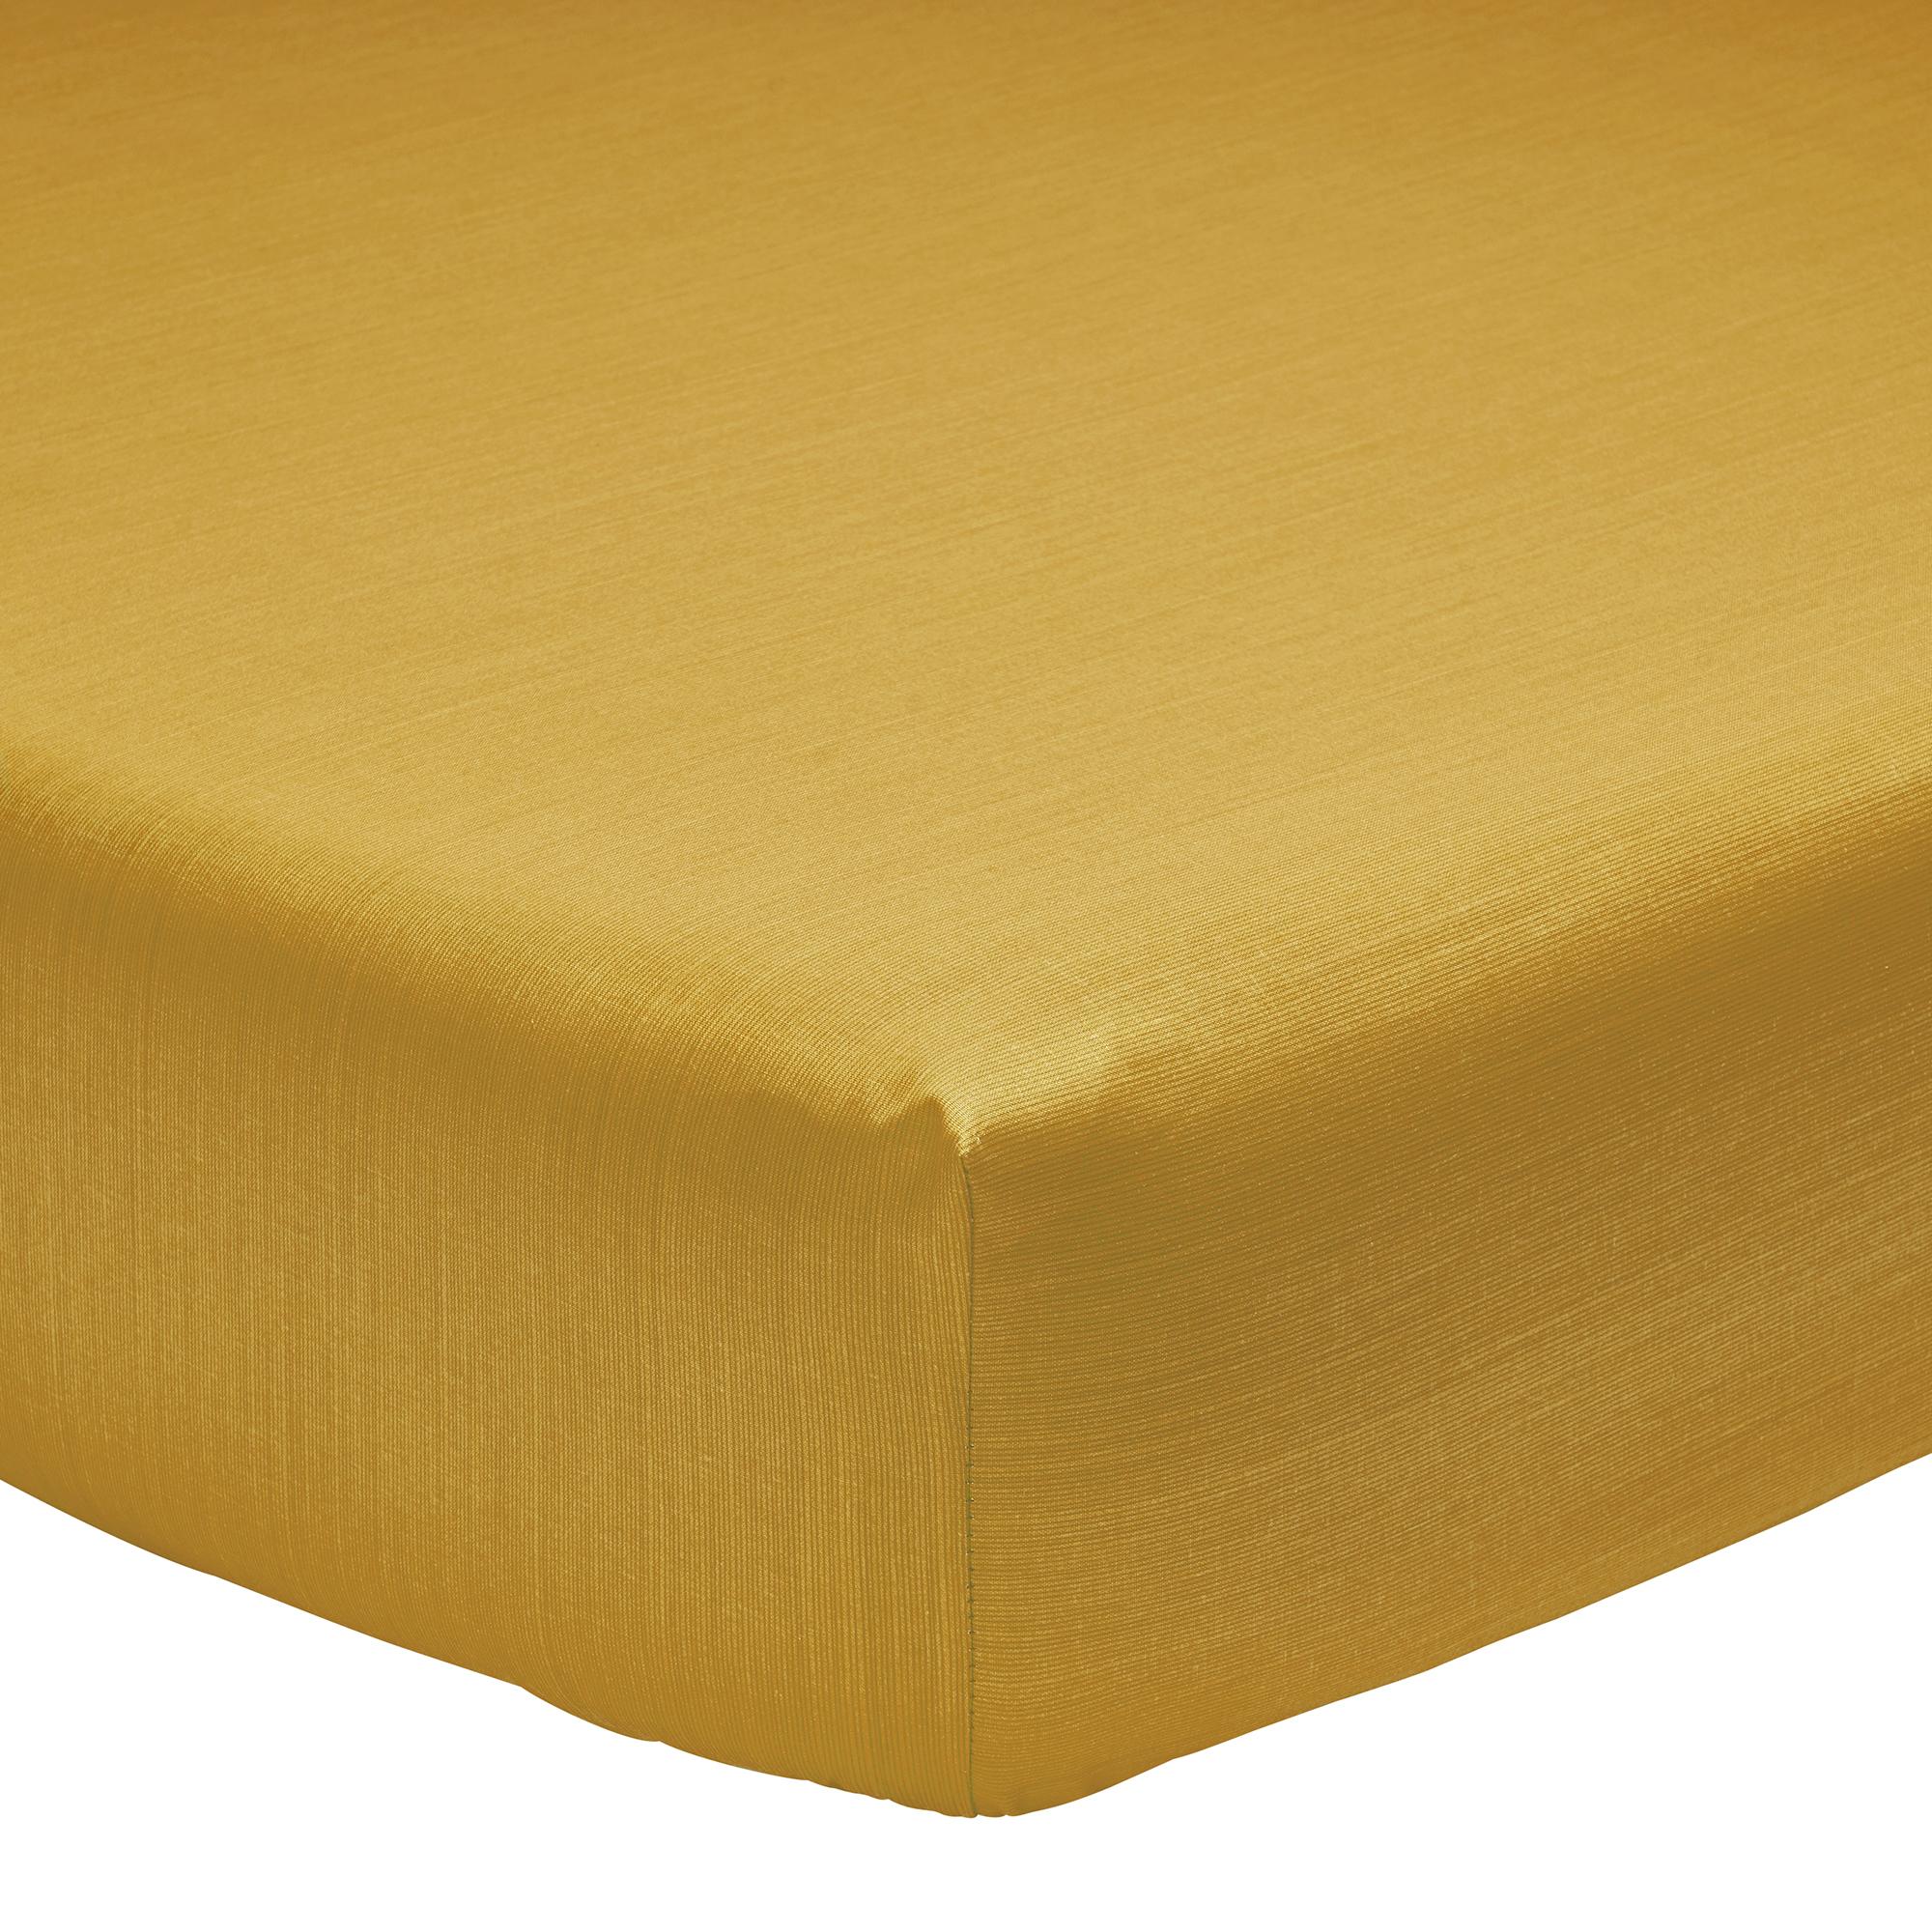 Drap housse fines rayures en bambou jaune 140 x 190